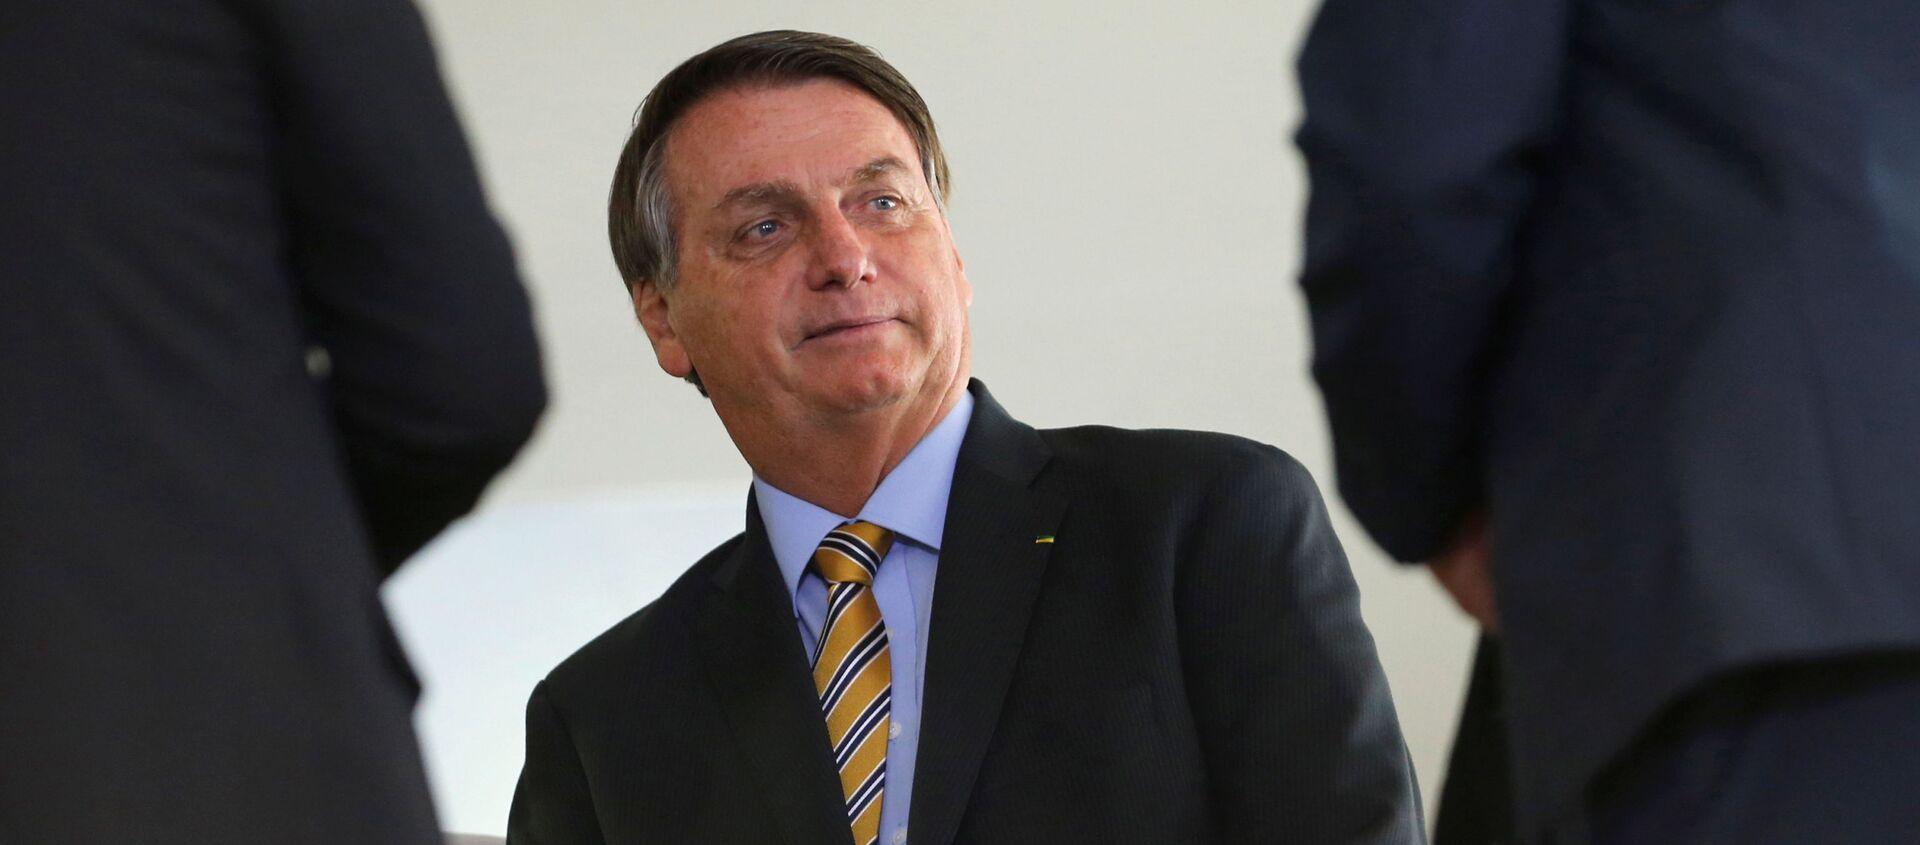 Jair Bolsonaro, presidente de Brasil - Sputnik Mundo, 1920, 16.12.2020